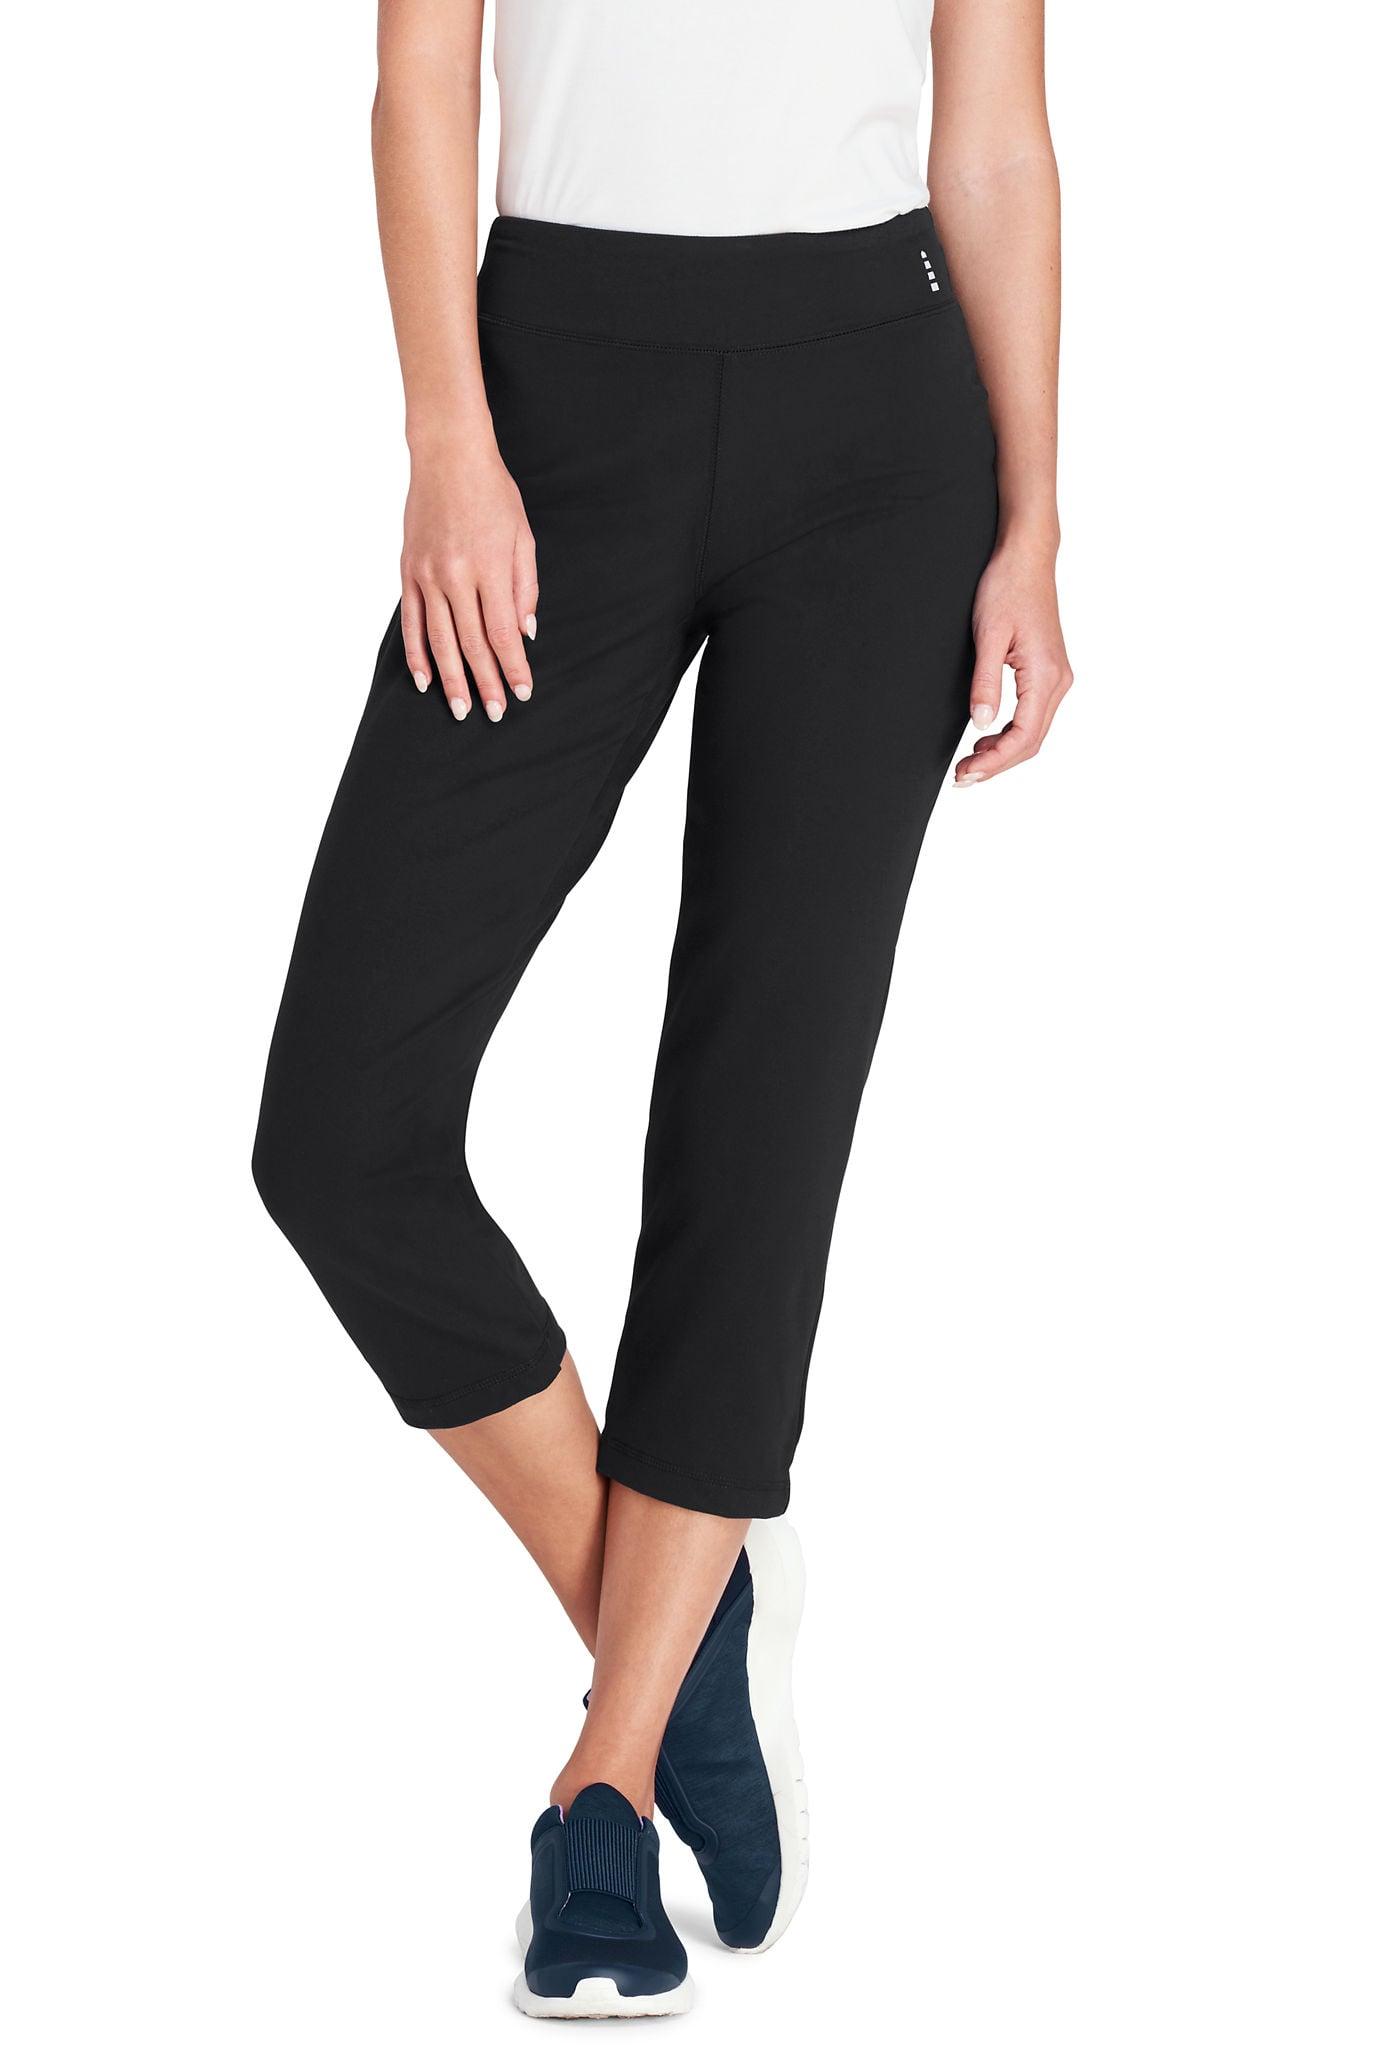 9fcb2e68a4a53 Lands' End Women's Tall Active Crop Yoga Pant | The 15 Most ...